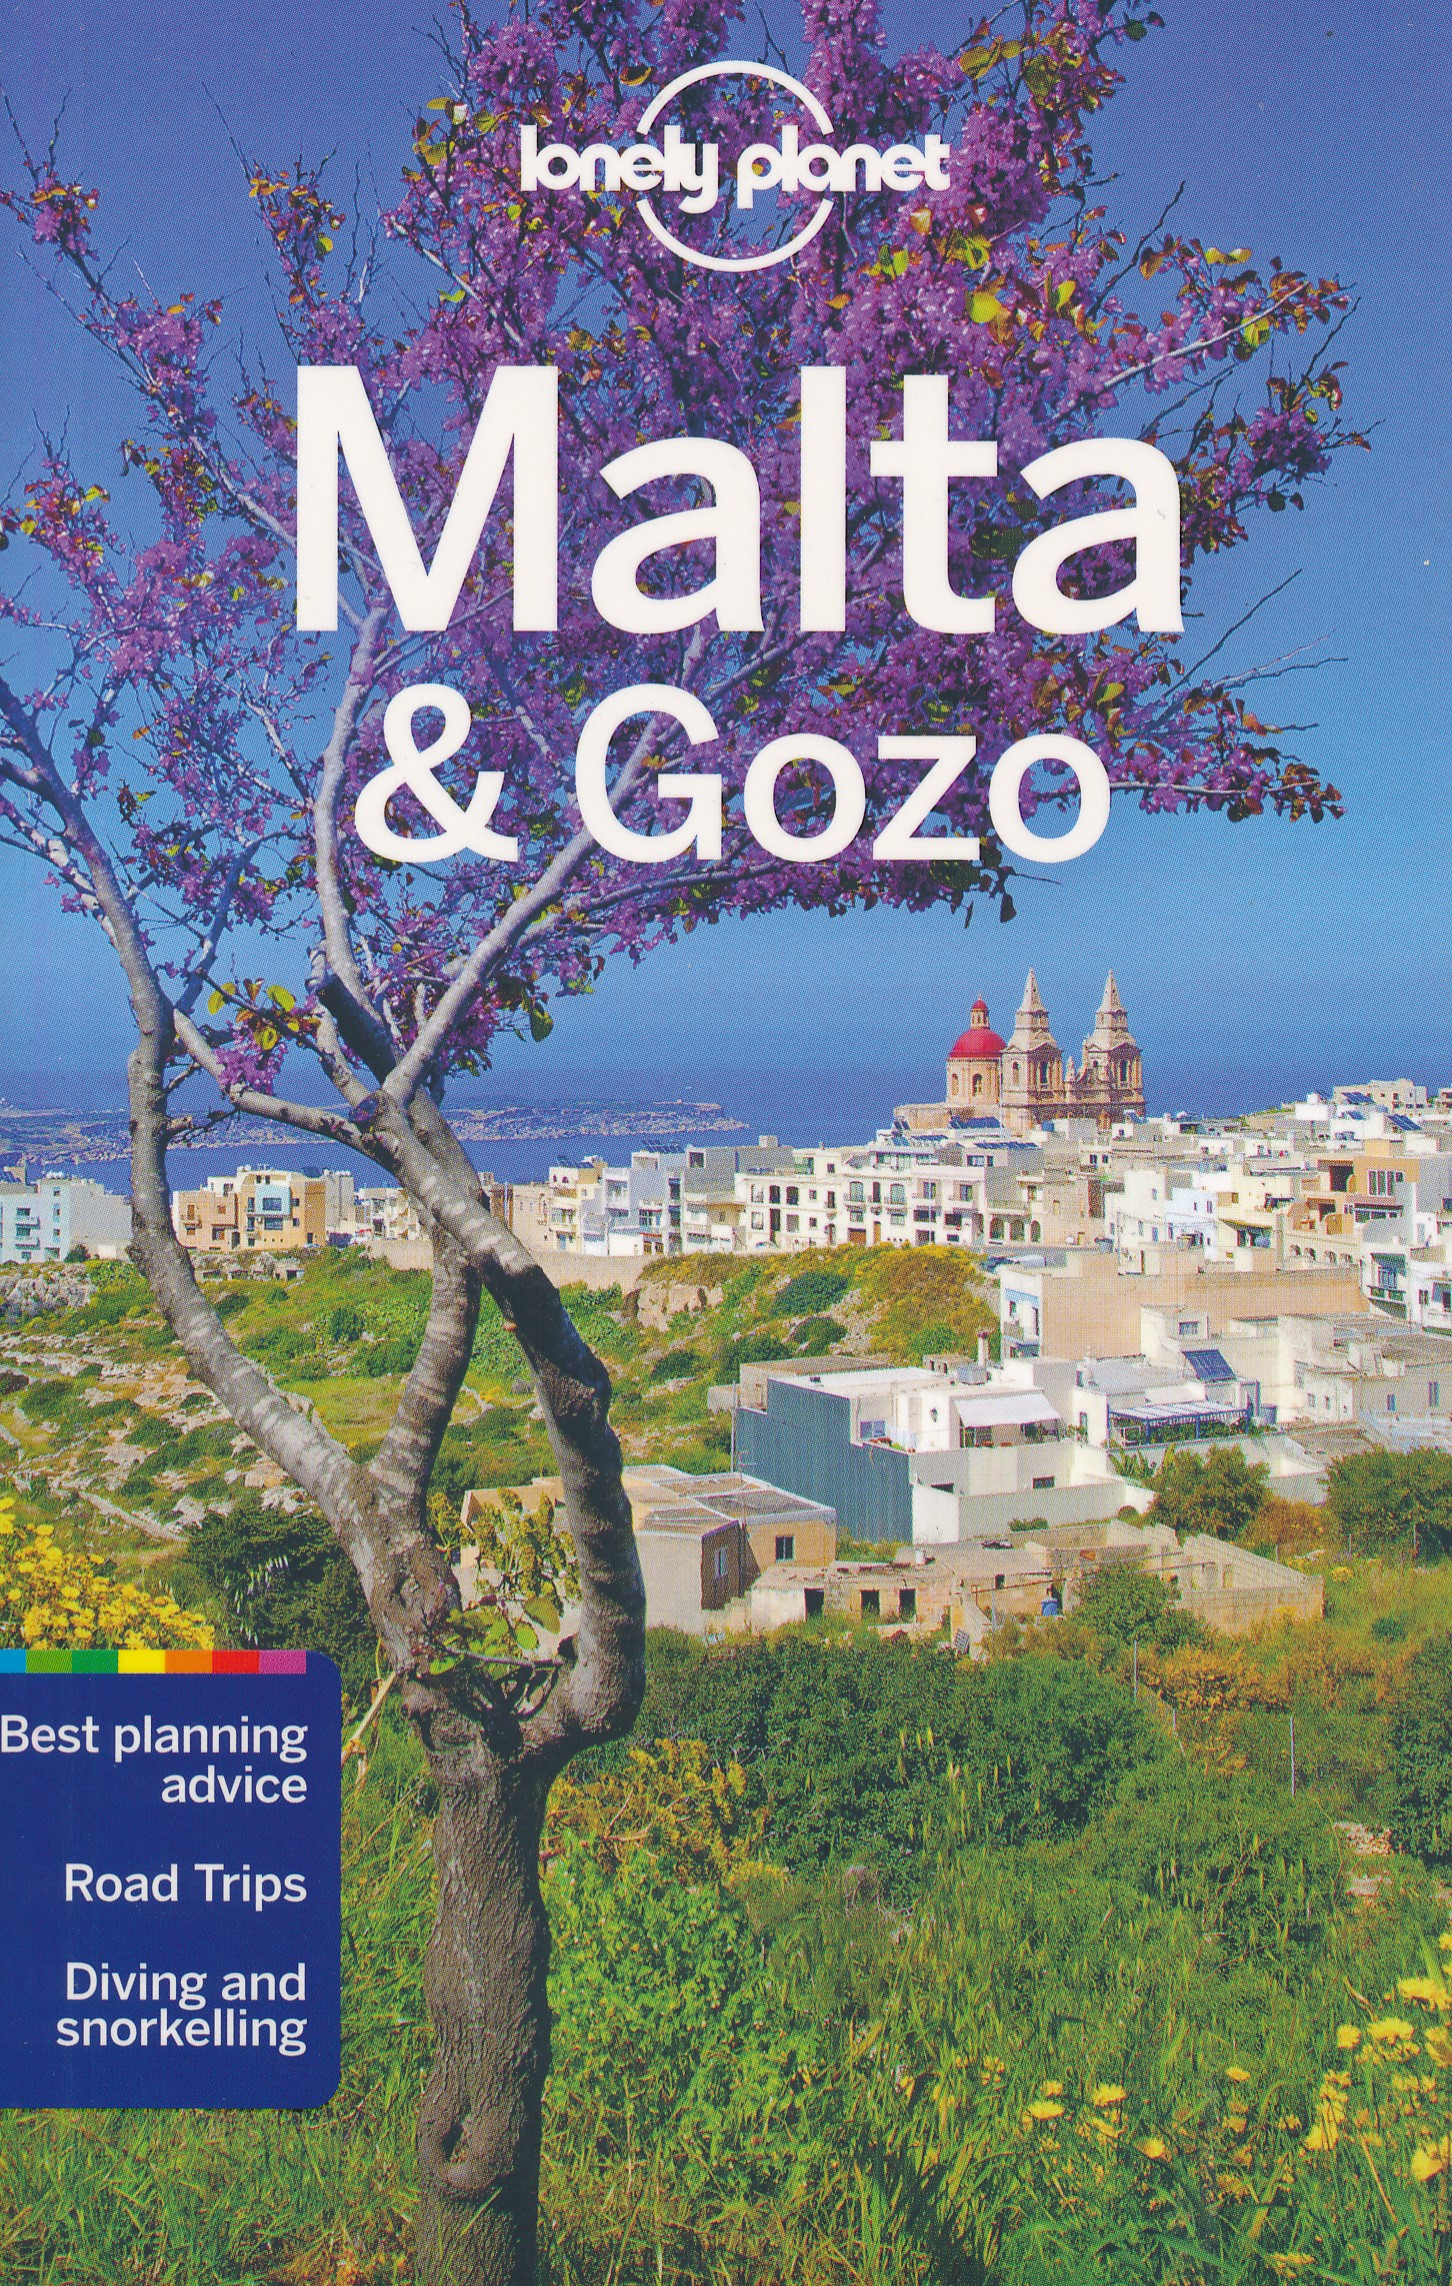 Malta dating sites gratis